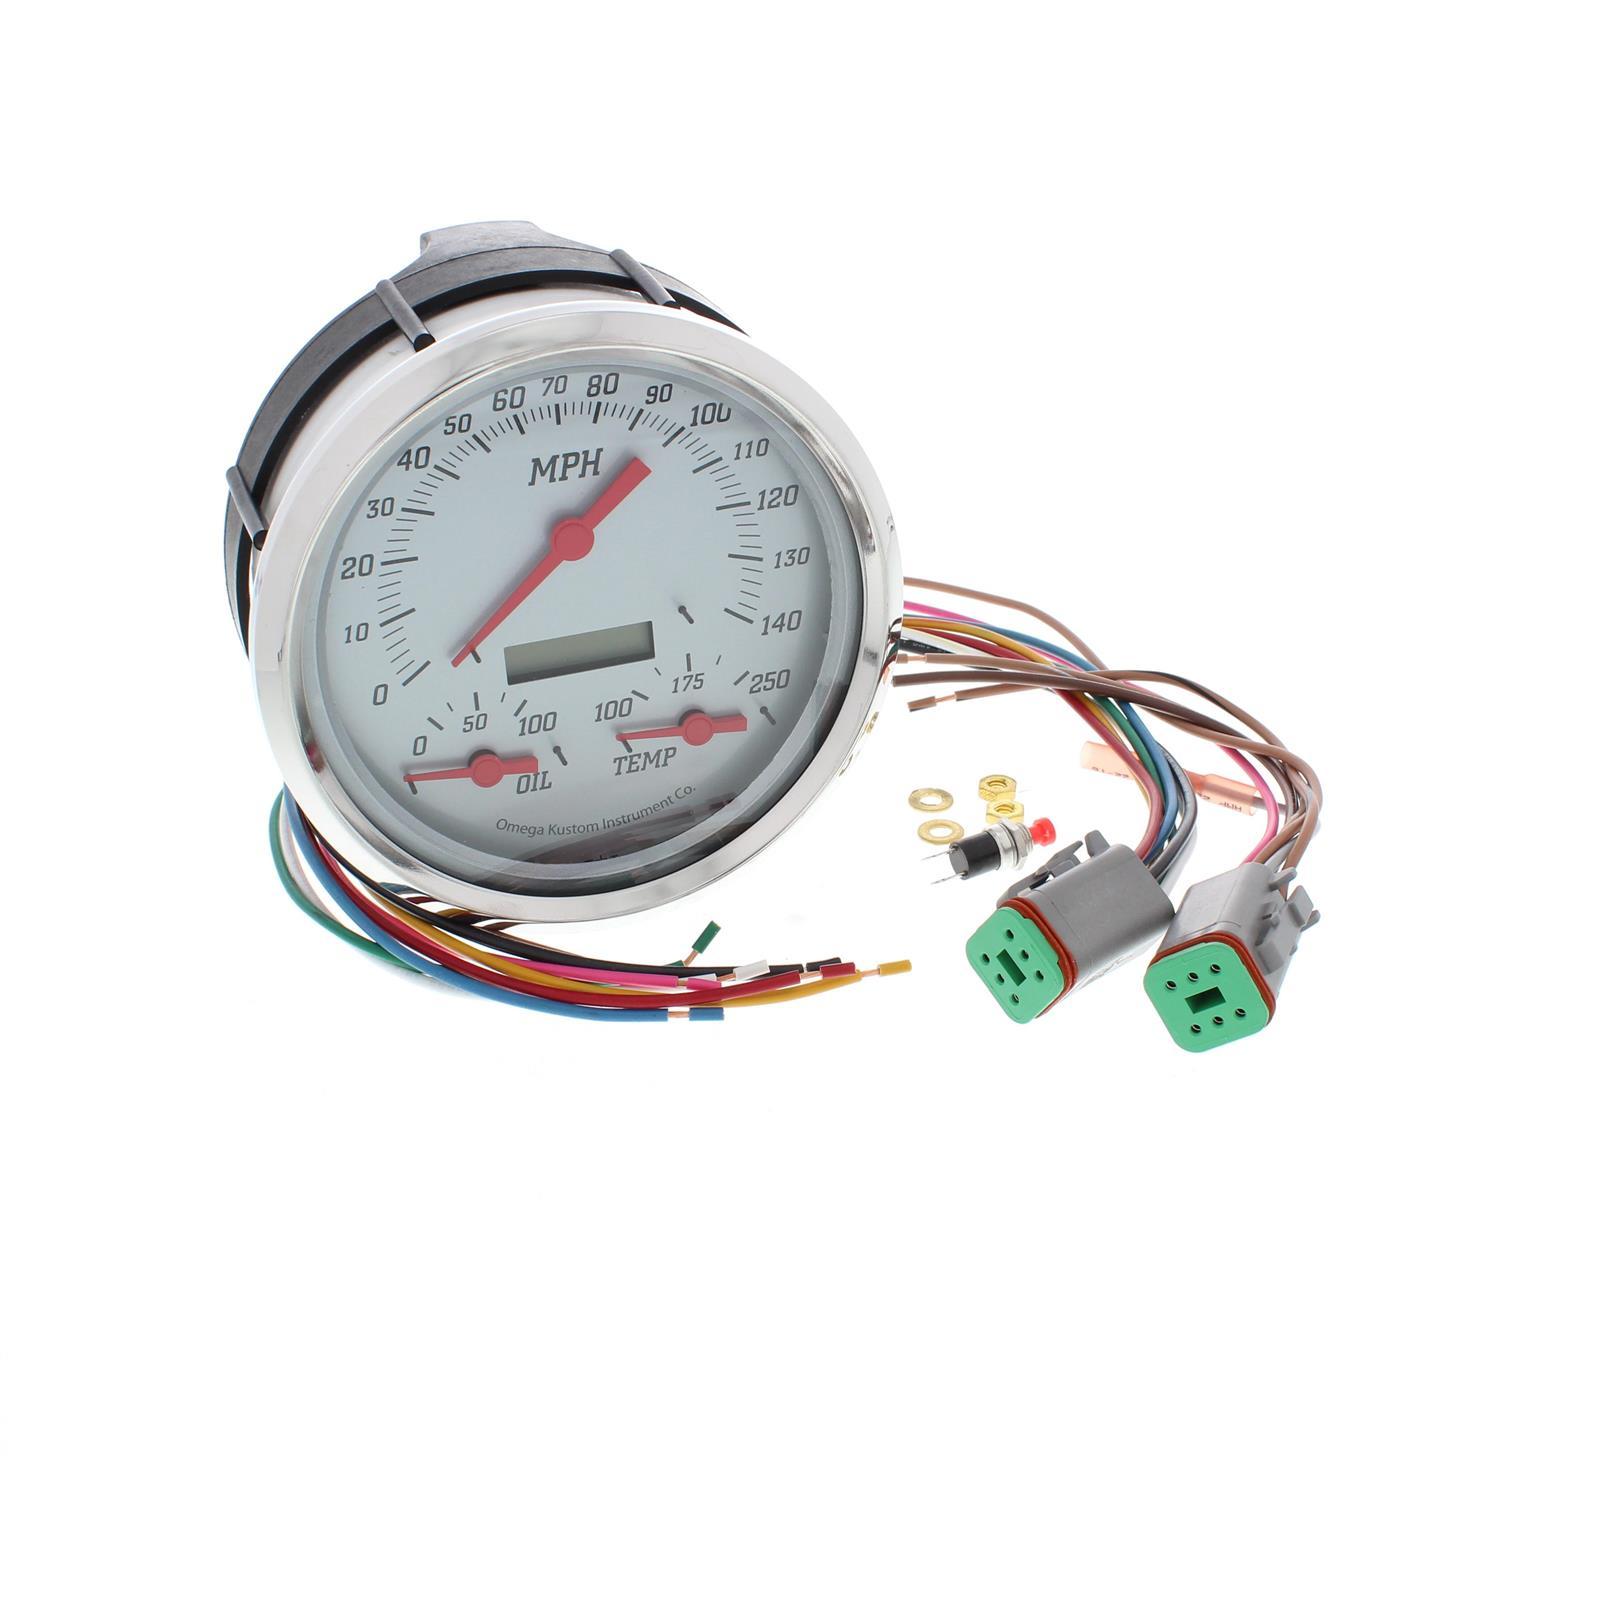 Omega Kustom 5 Speedometer W Oil Pressure Water Temp Silver Acb Wiring